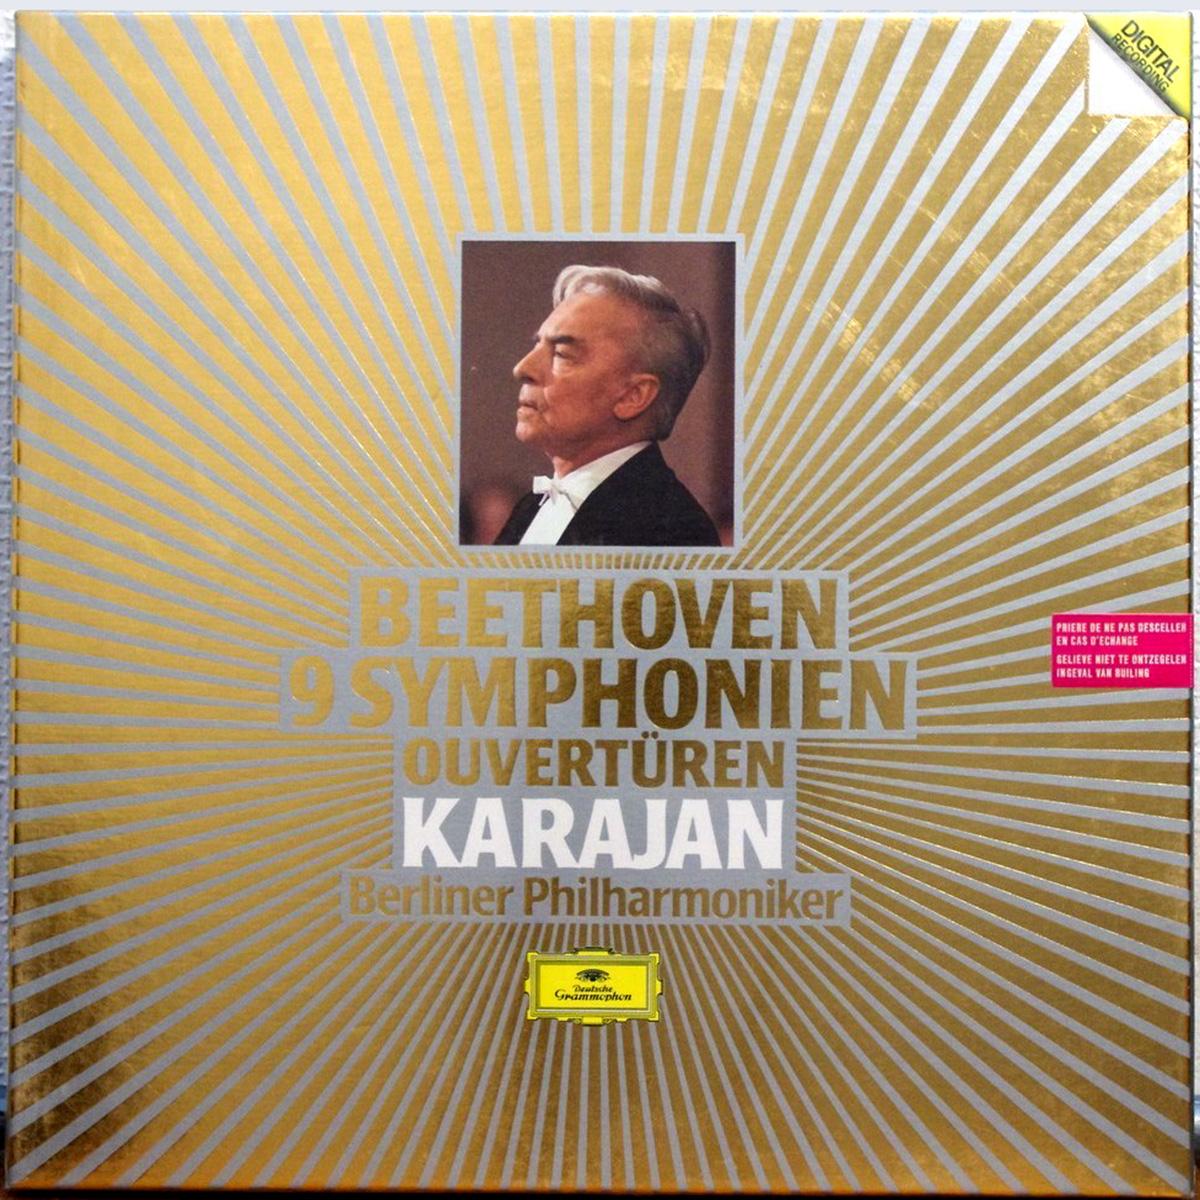 DGG 415066 Beethoven Integrale Symphonies Karajan